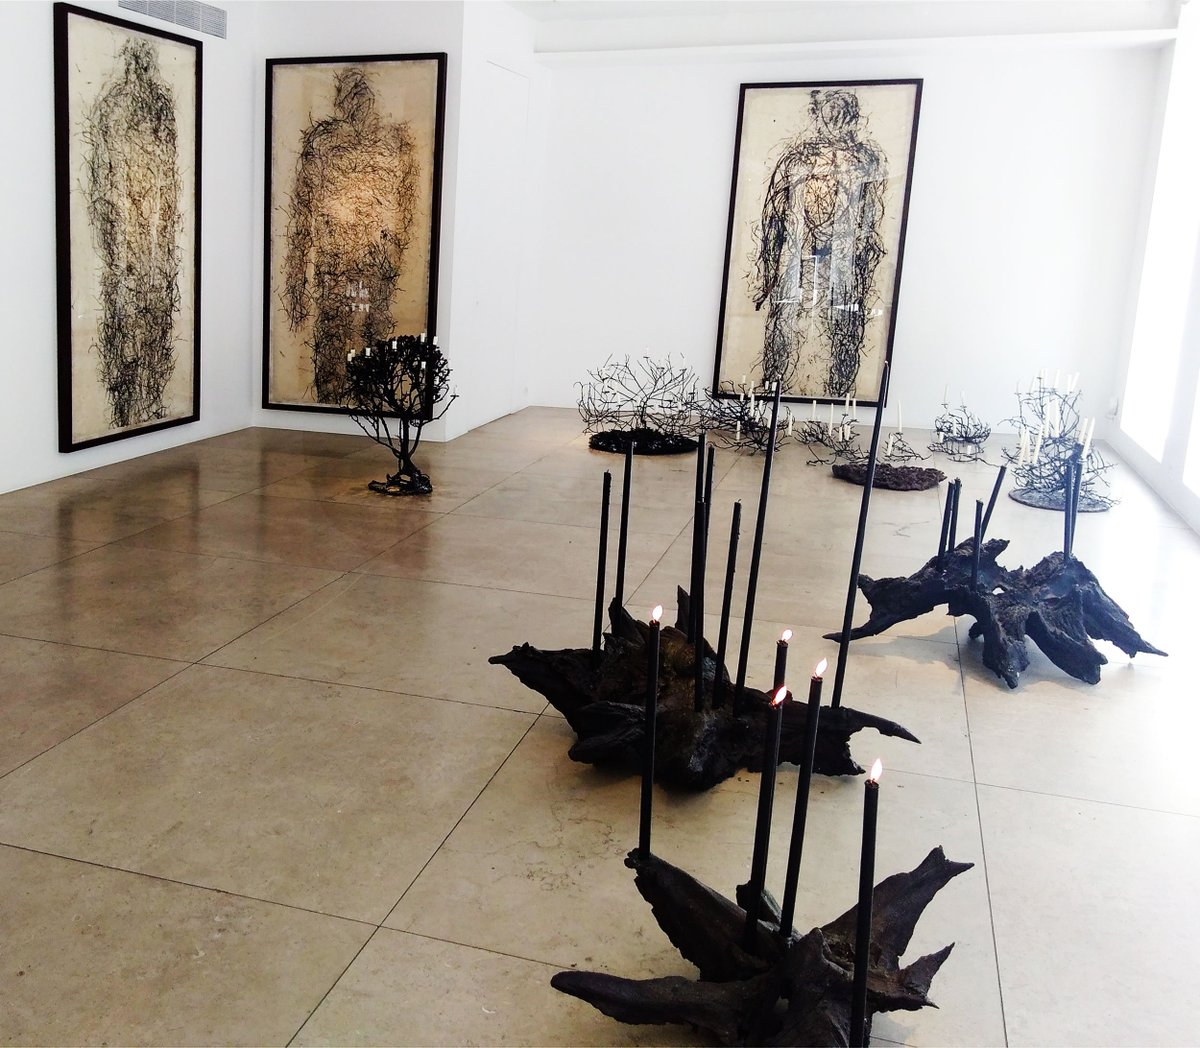 6bee3957d209  art  london  contemporaryart https   www.ennigaldi.co.uk journal 2018 4 25 michele-oka-doner-bringing-the-fire-at-david-gill-gallery  …pic.twitter.com  ...